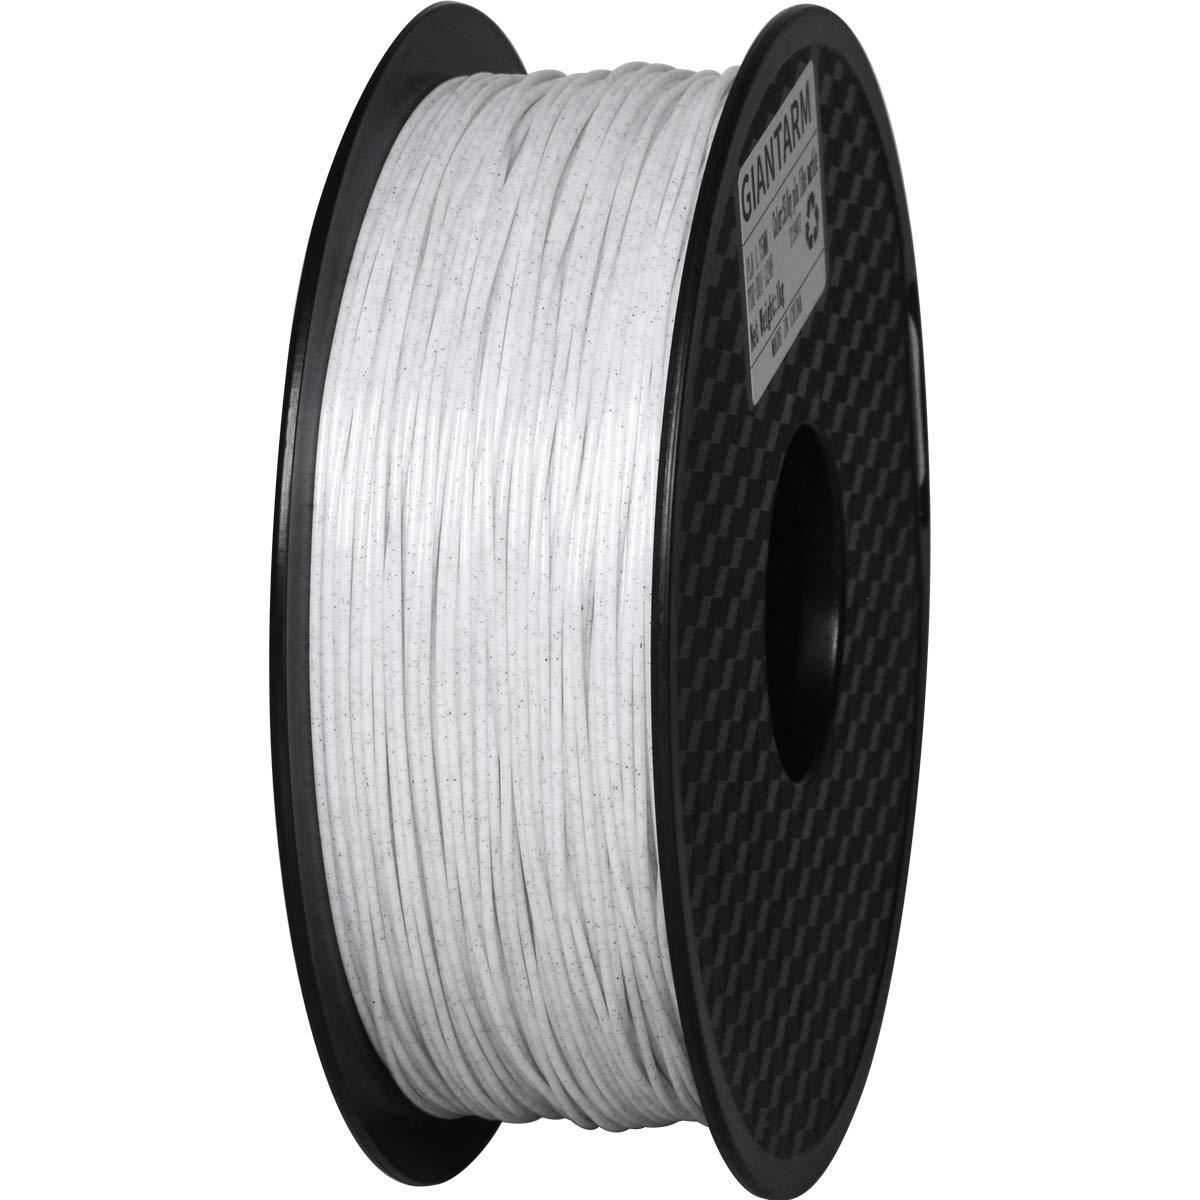 GIANTARM Filamento PLA 1.75mm Silk Oro Stampante 3D PLA Filamento 1kg Spool